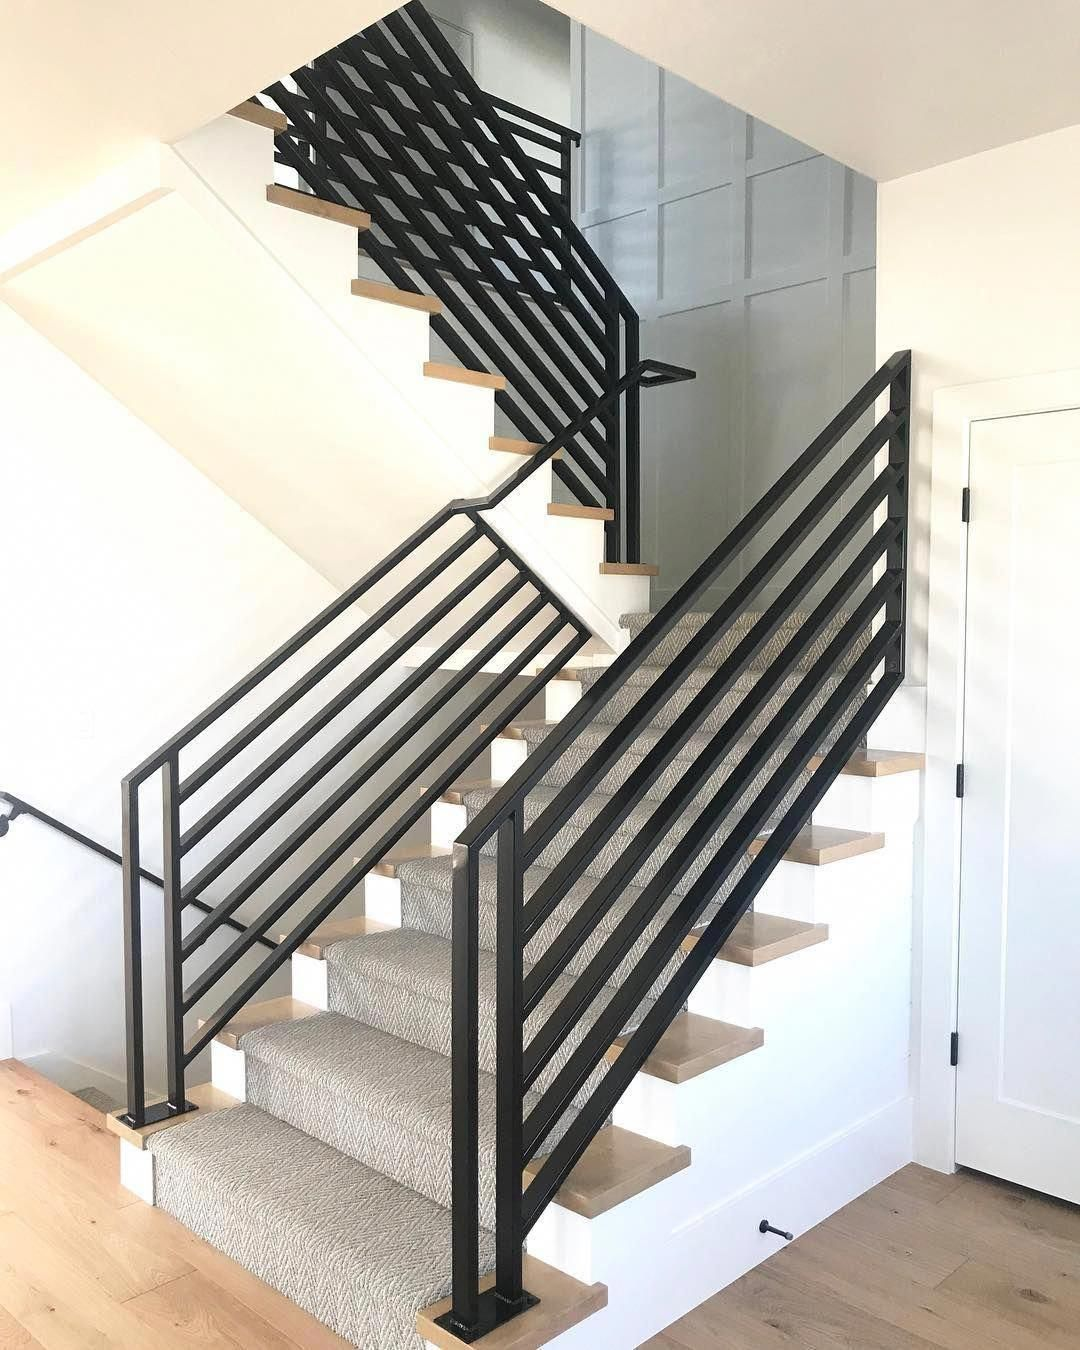 Best Carpetrunnersukfacebook Staircase Design Stairs 400 x 300